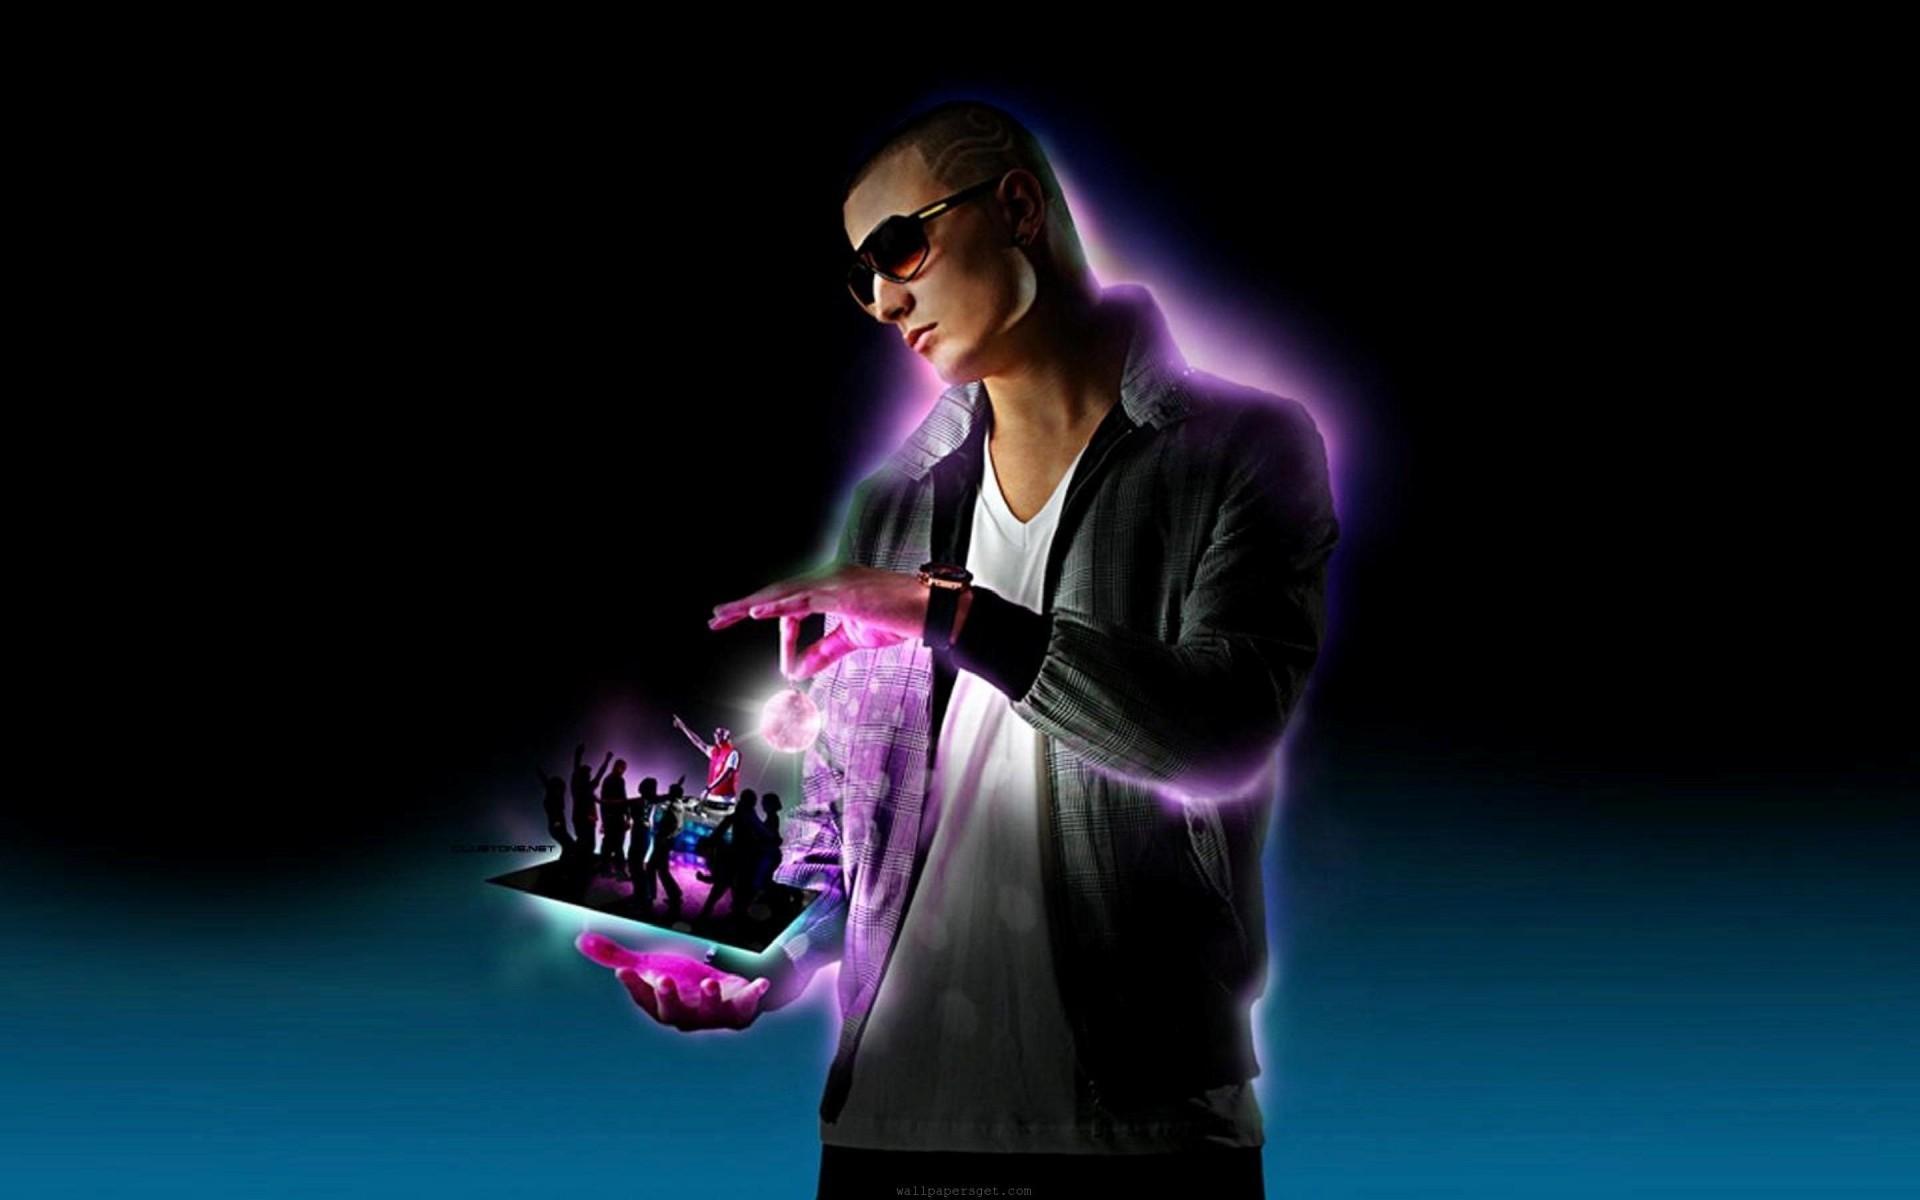 DJ Snake Wallpapers HD